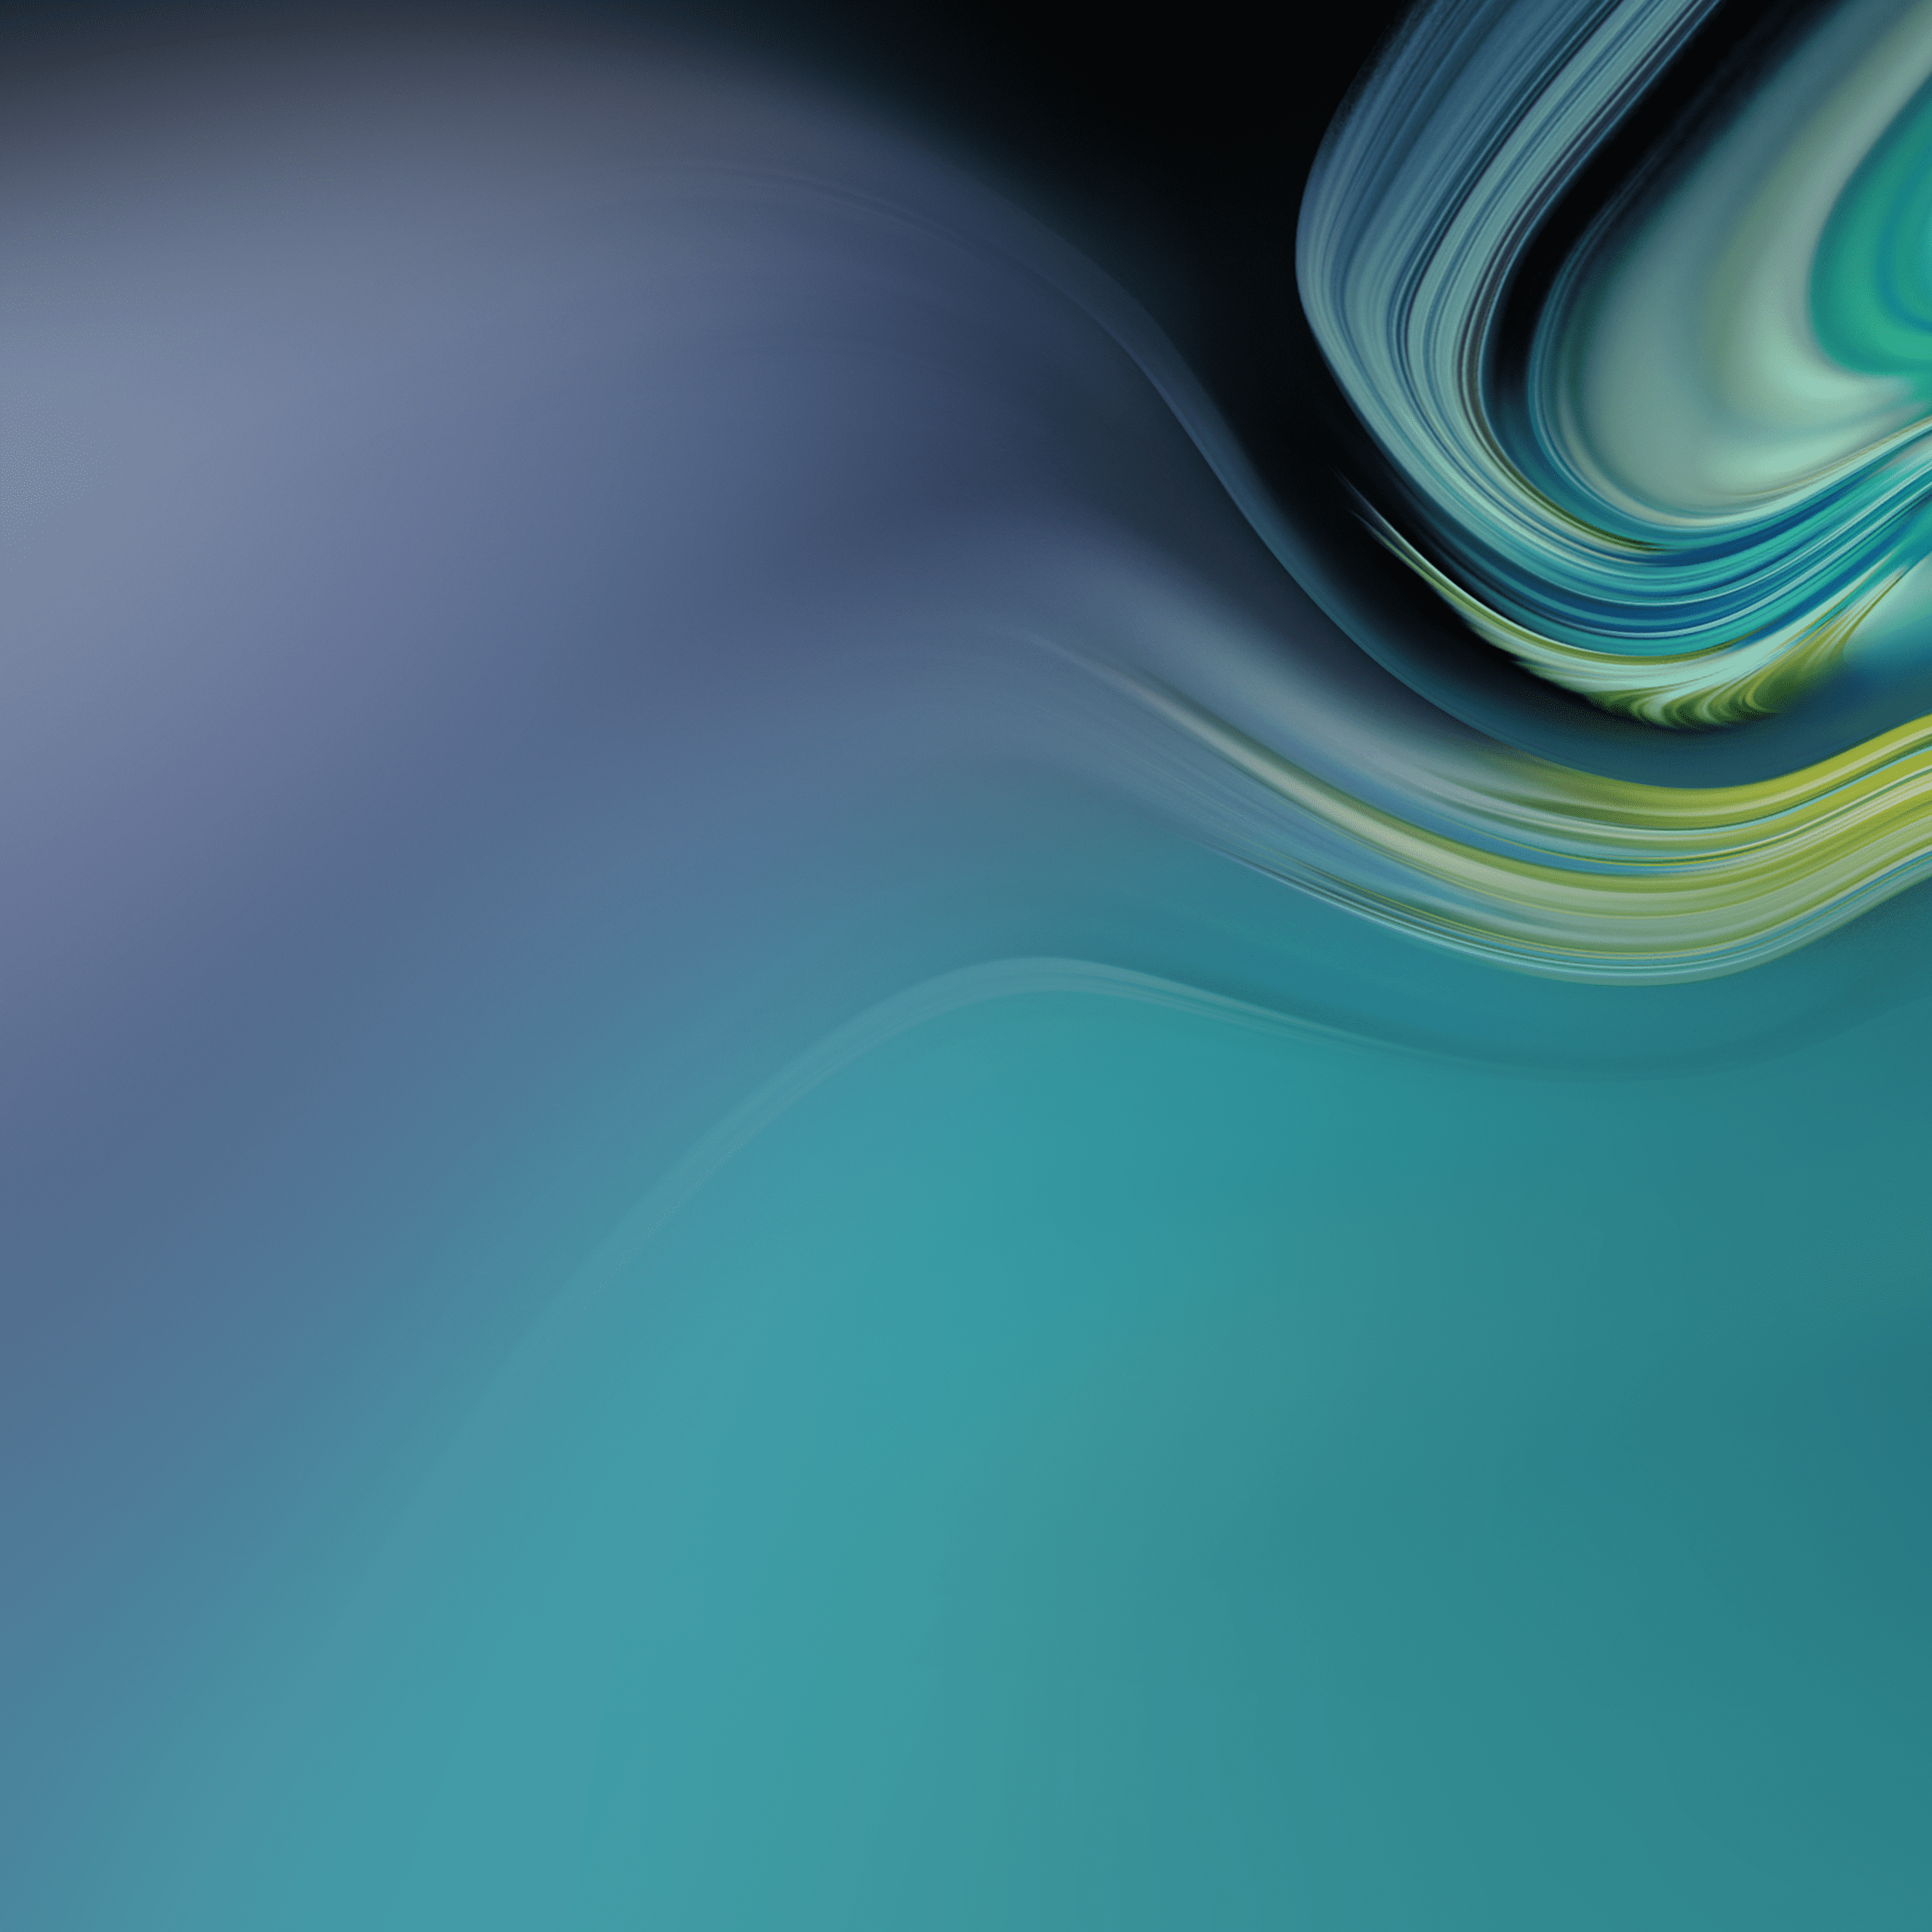 Samsung Galaxy Tab S4 Wallpapers